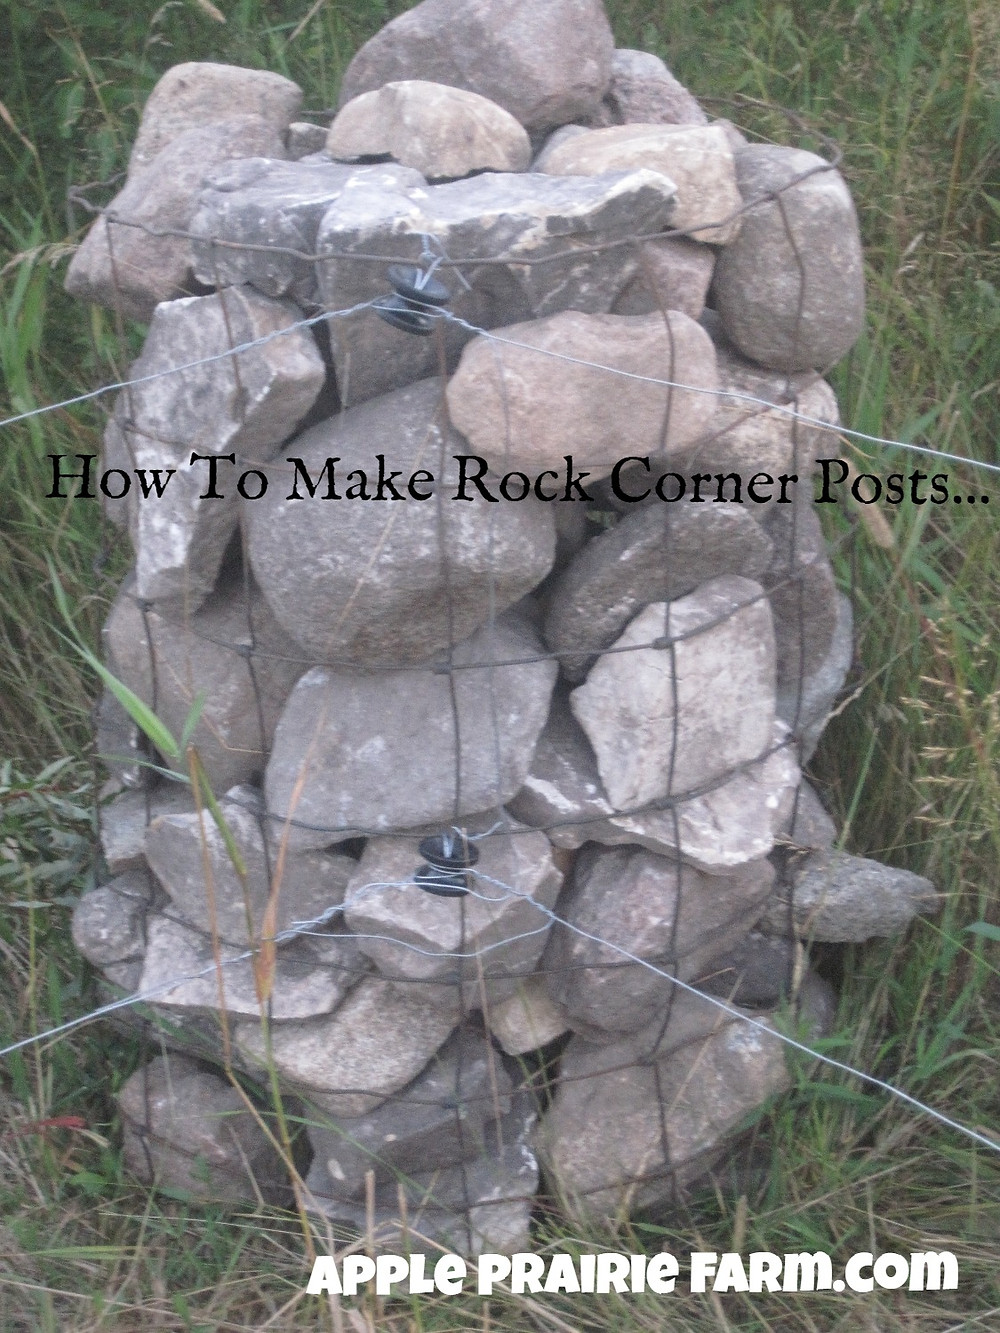 Rock corner post, apple prairie farm